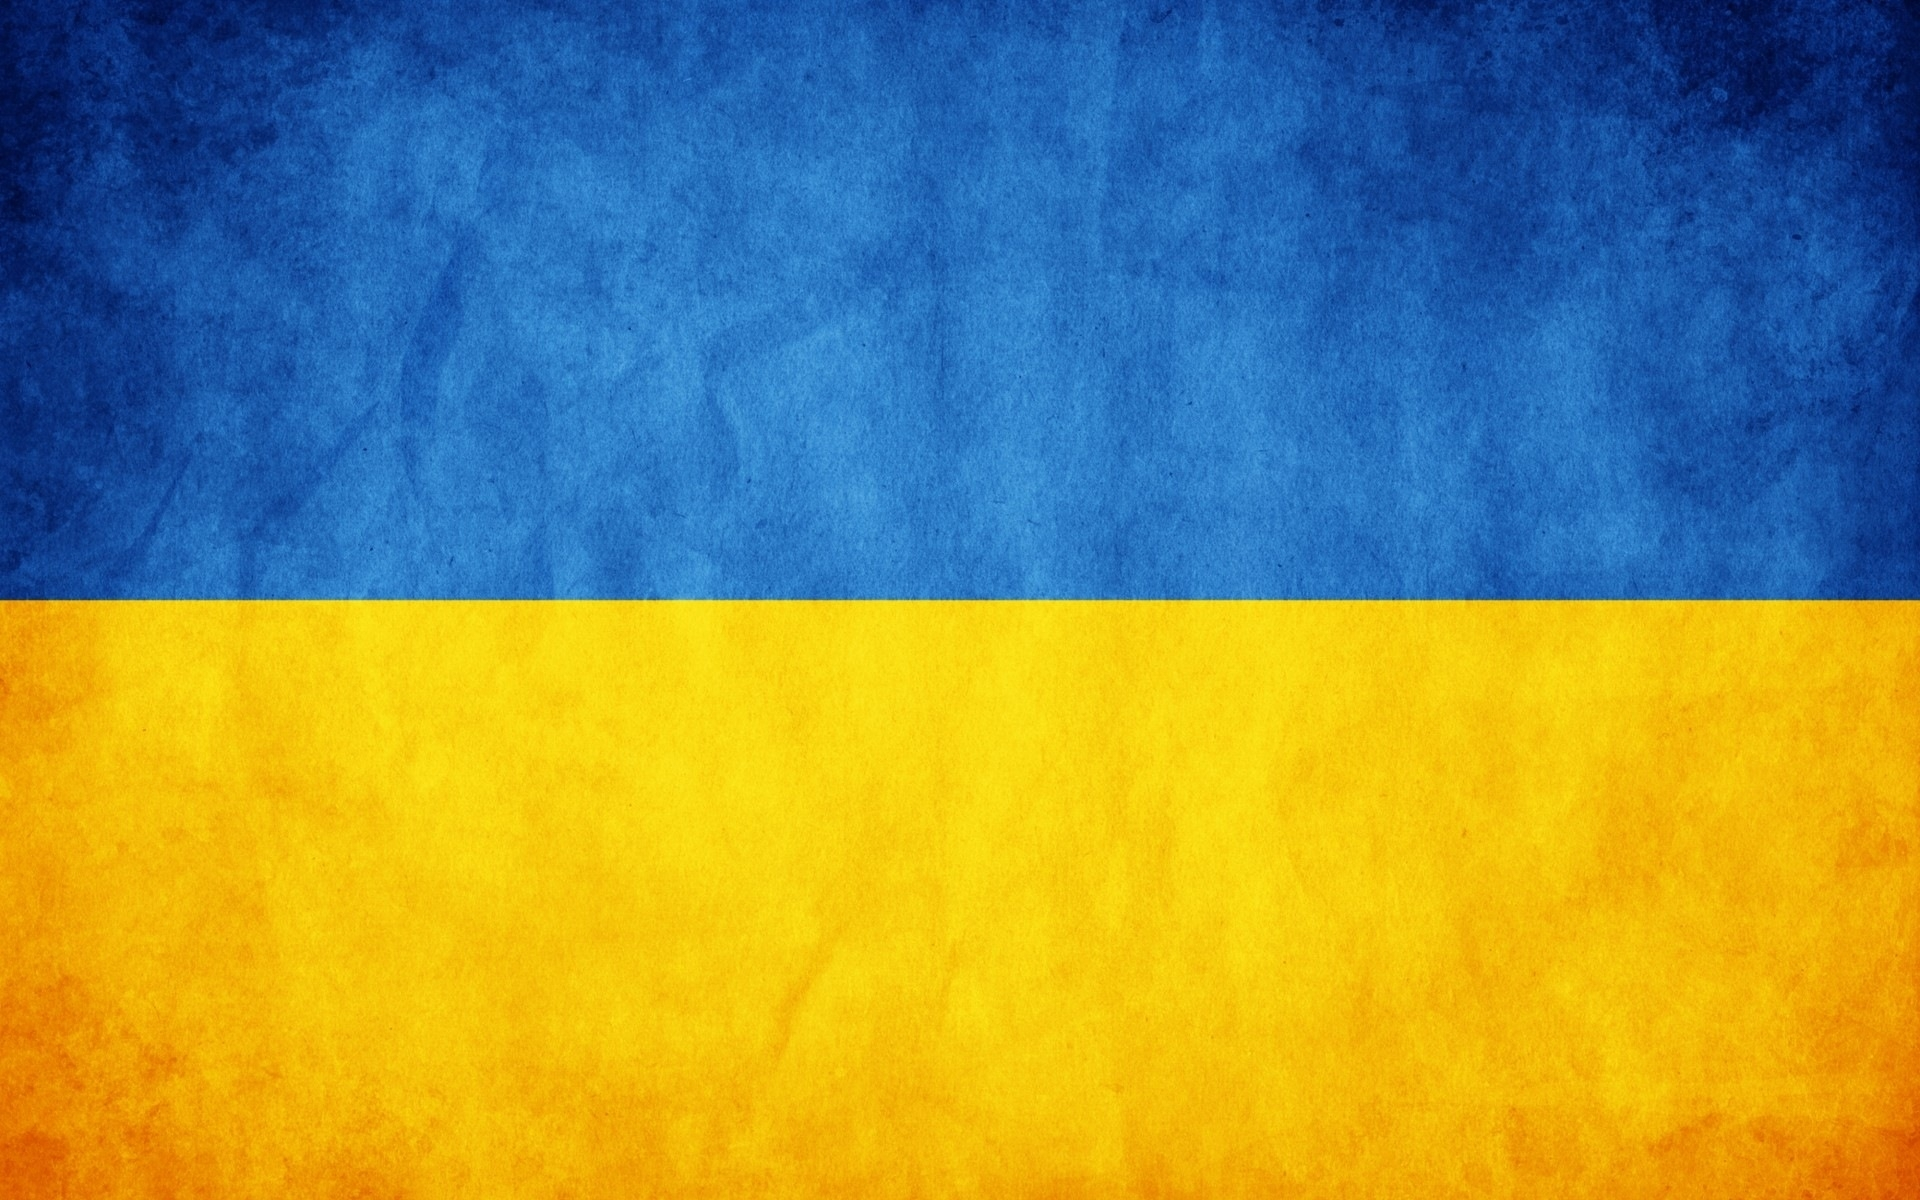 41377 Заставки и Обои Флаги на телефон. Скачать Фон, Флаги картинки бесплатно